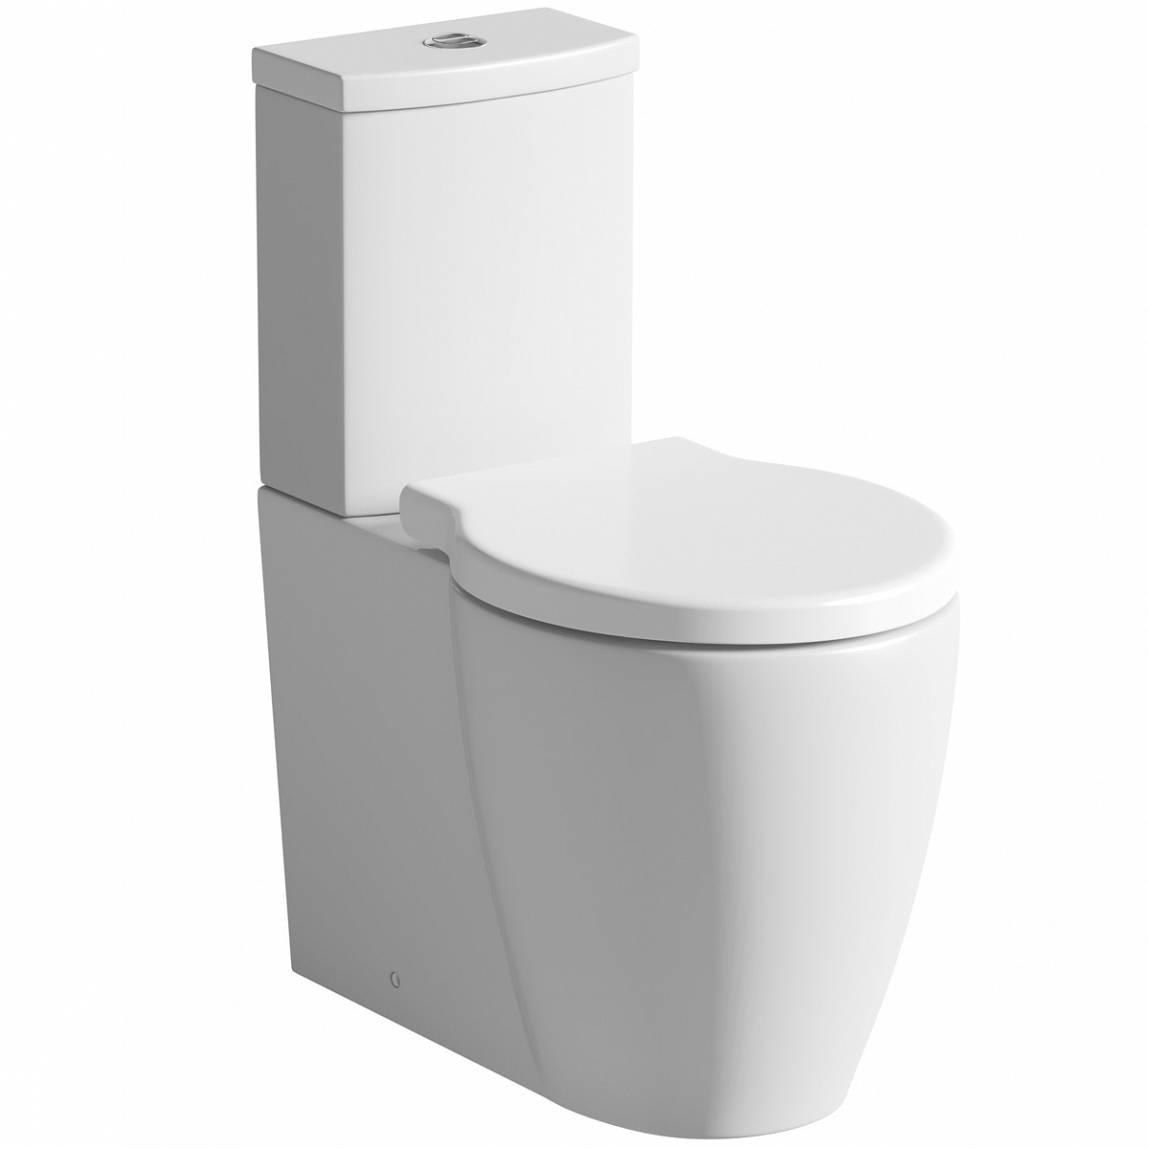 Image of Maine Close Coupled Toilet inc Luxury Soft Close Seat + Shut Off Valve